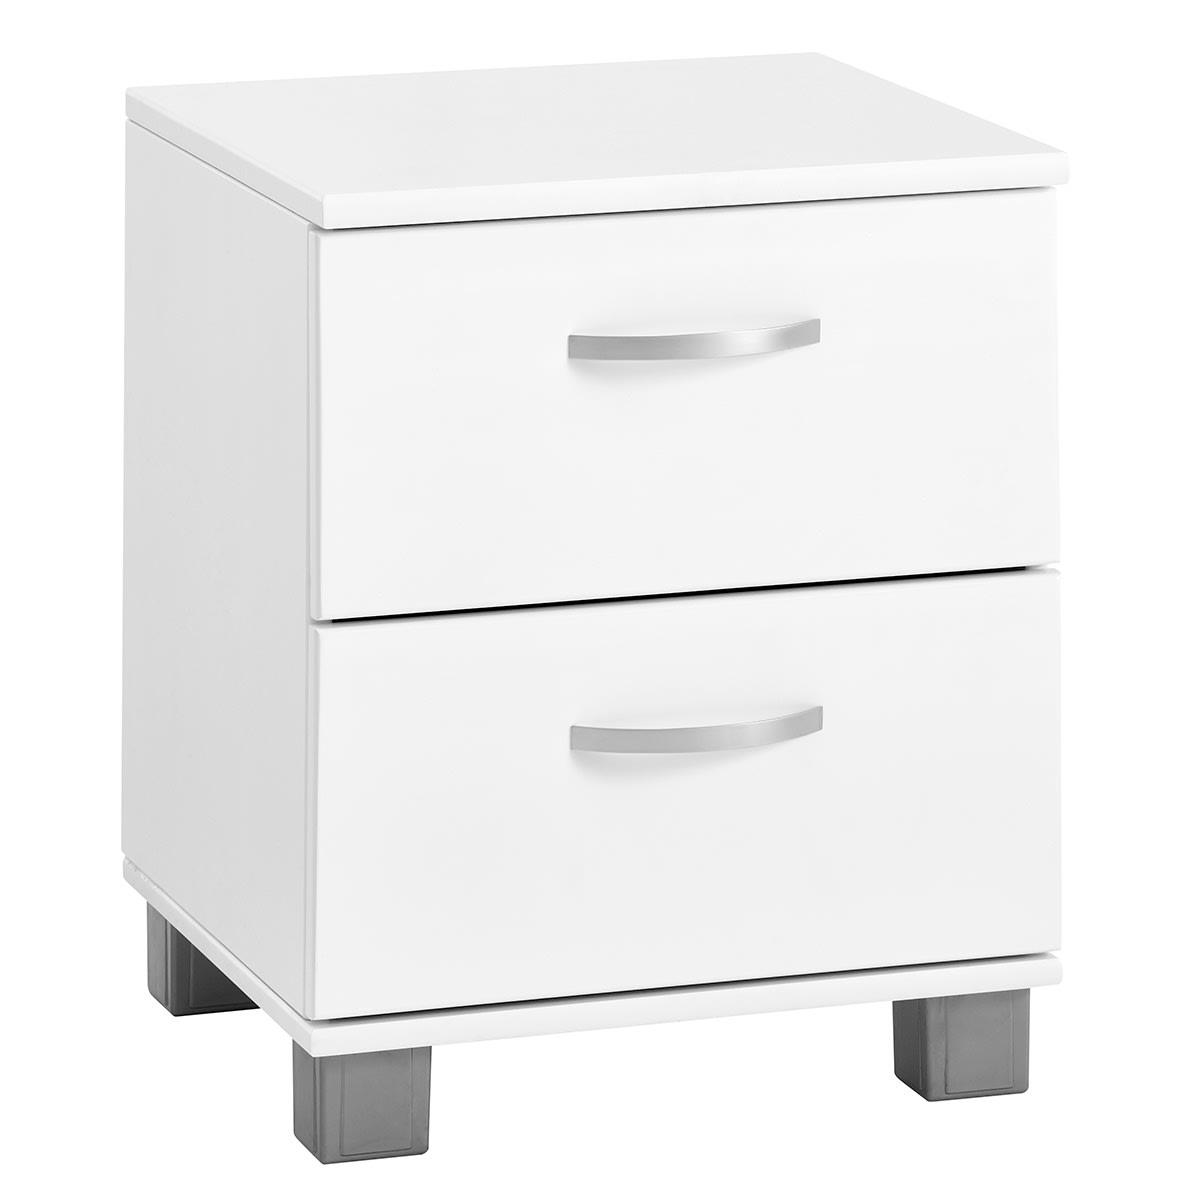 Natbord eller lille kommode til skrivebordet - 2 skuffer